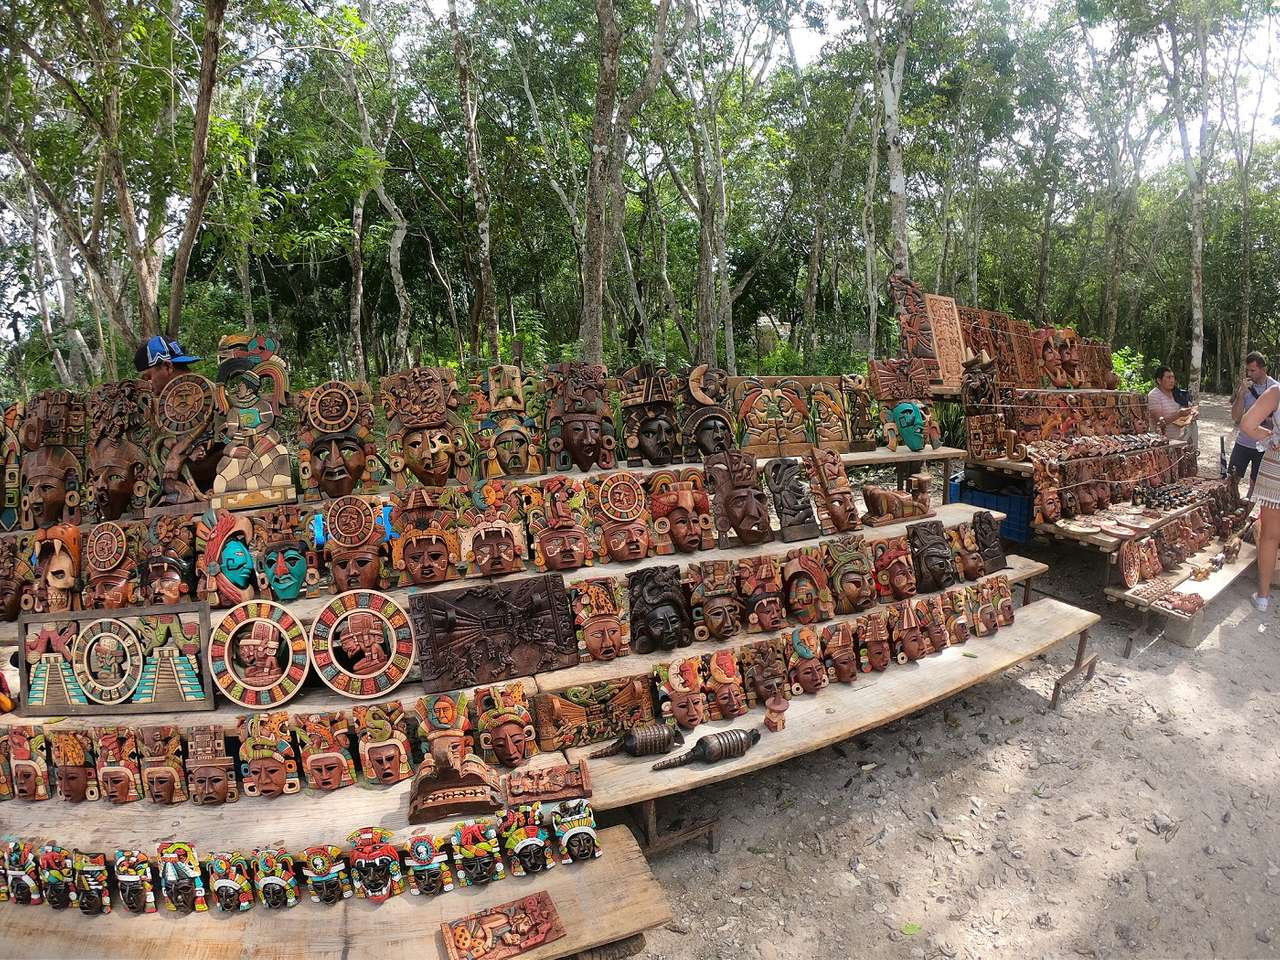 Chichen Itza - Mexiko skládačka